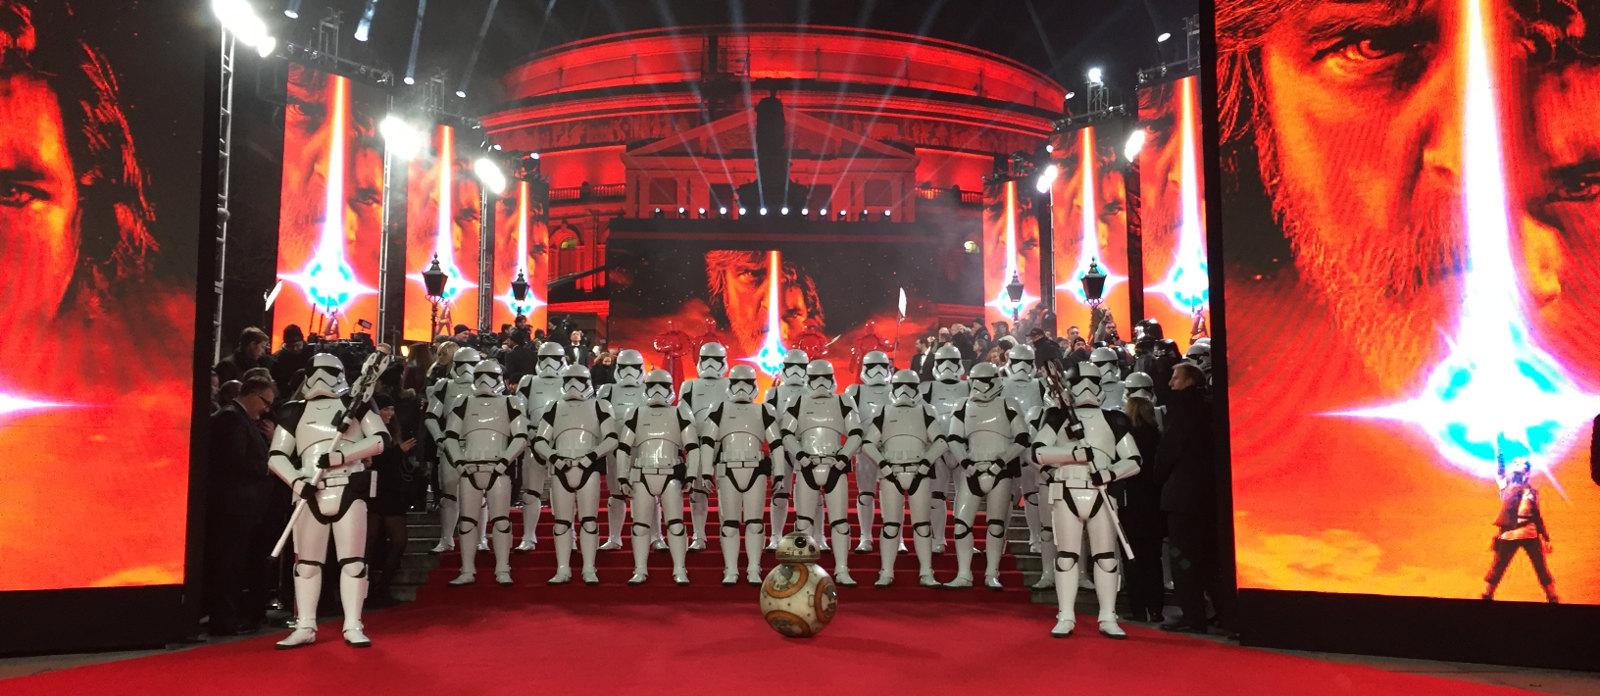 Star Wars Premier 2018